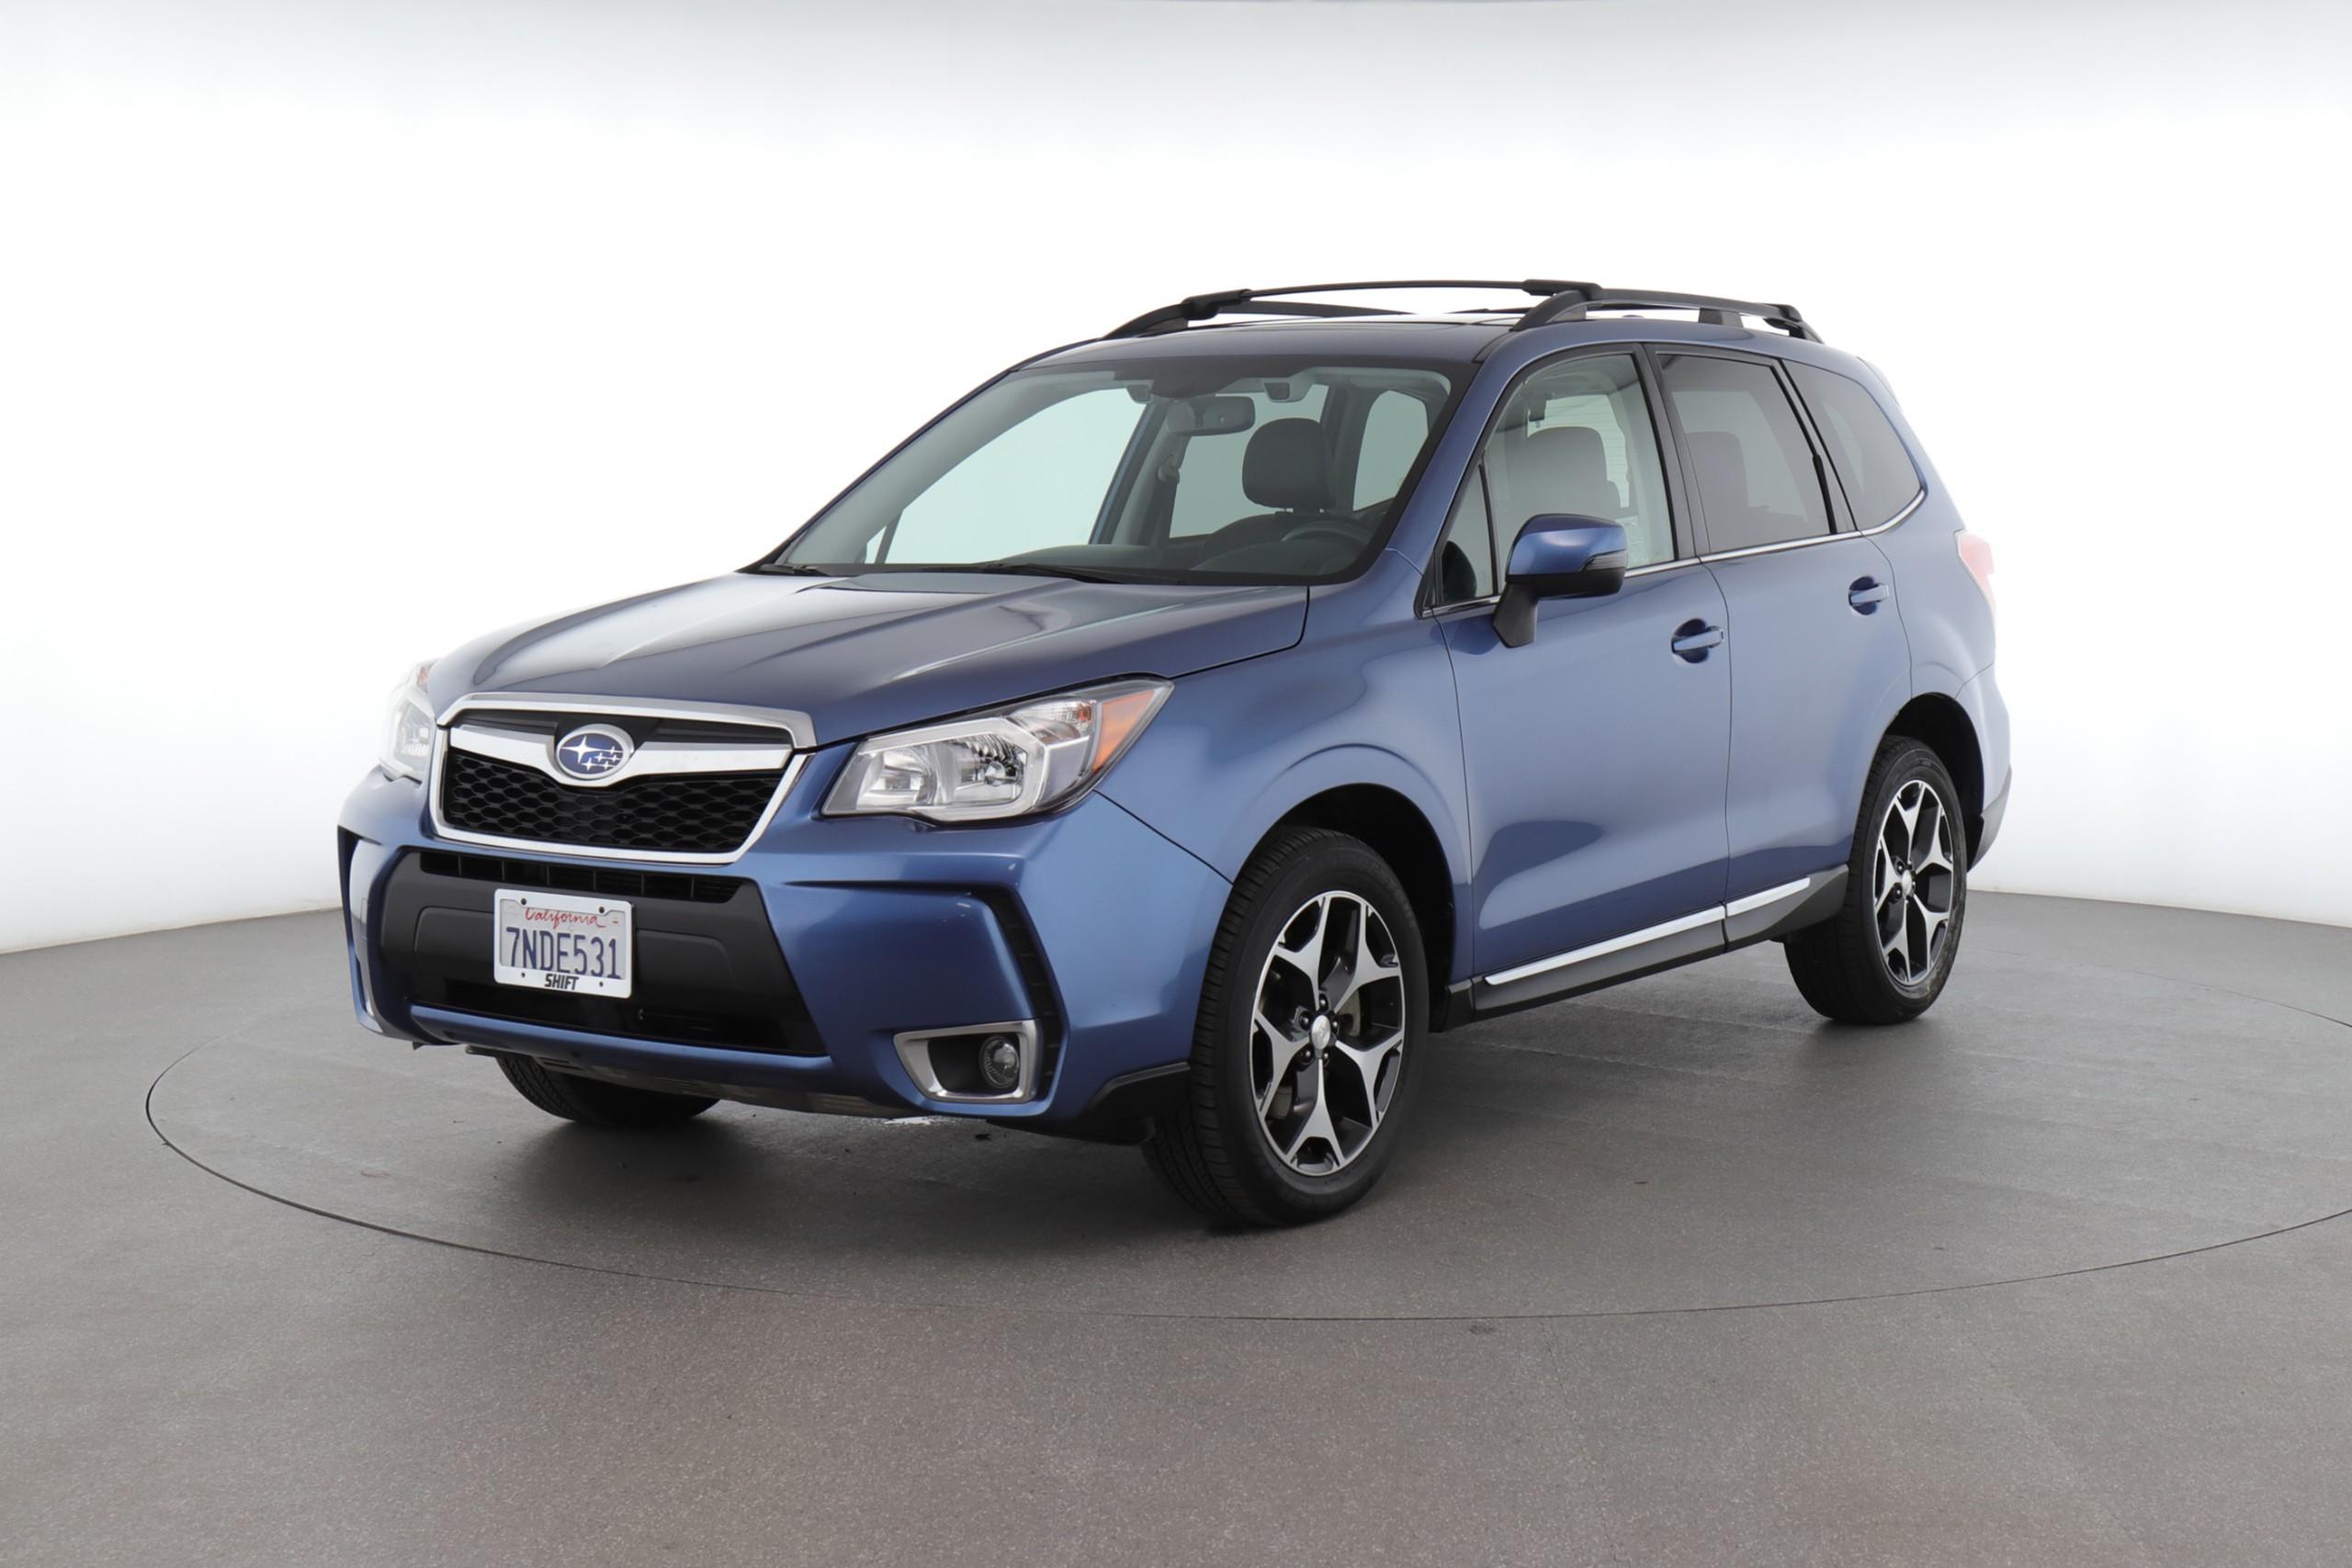 2. Subaru Forester